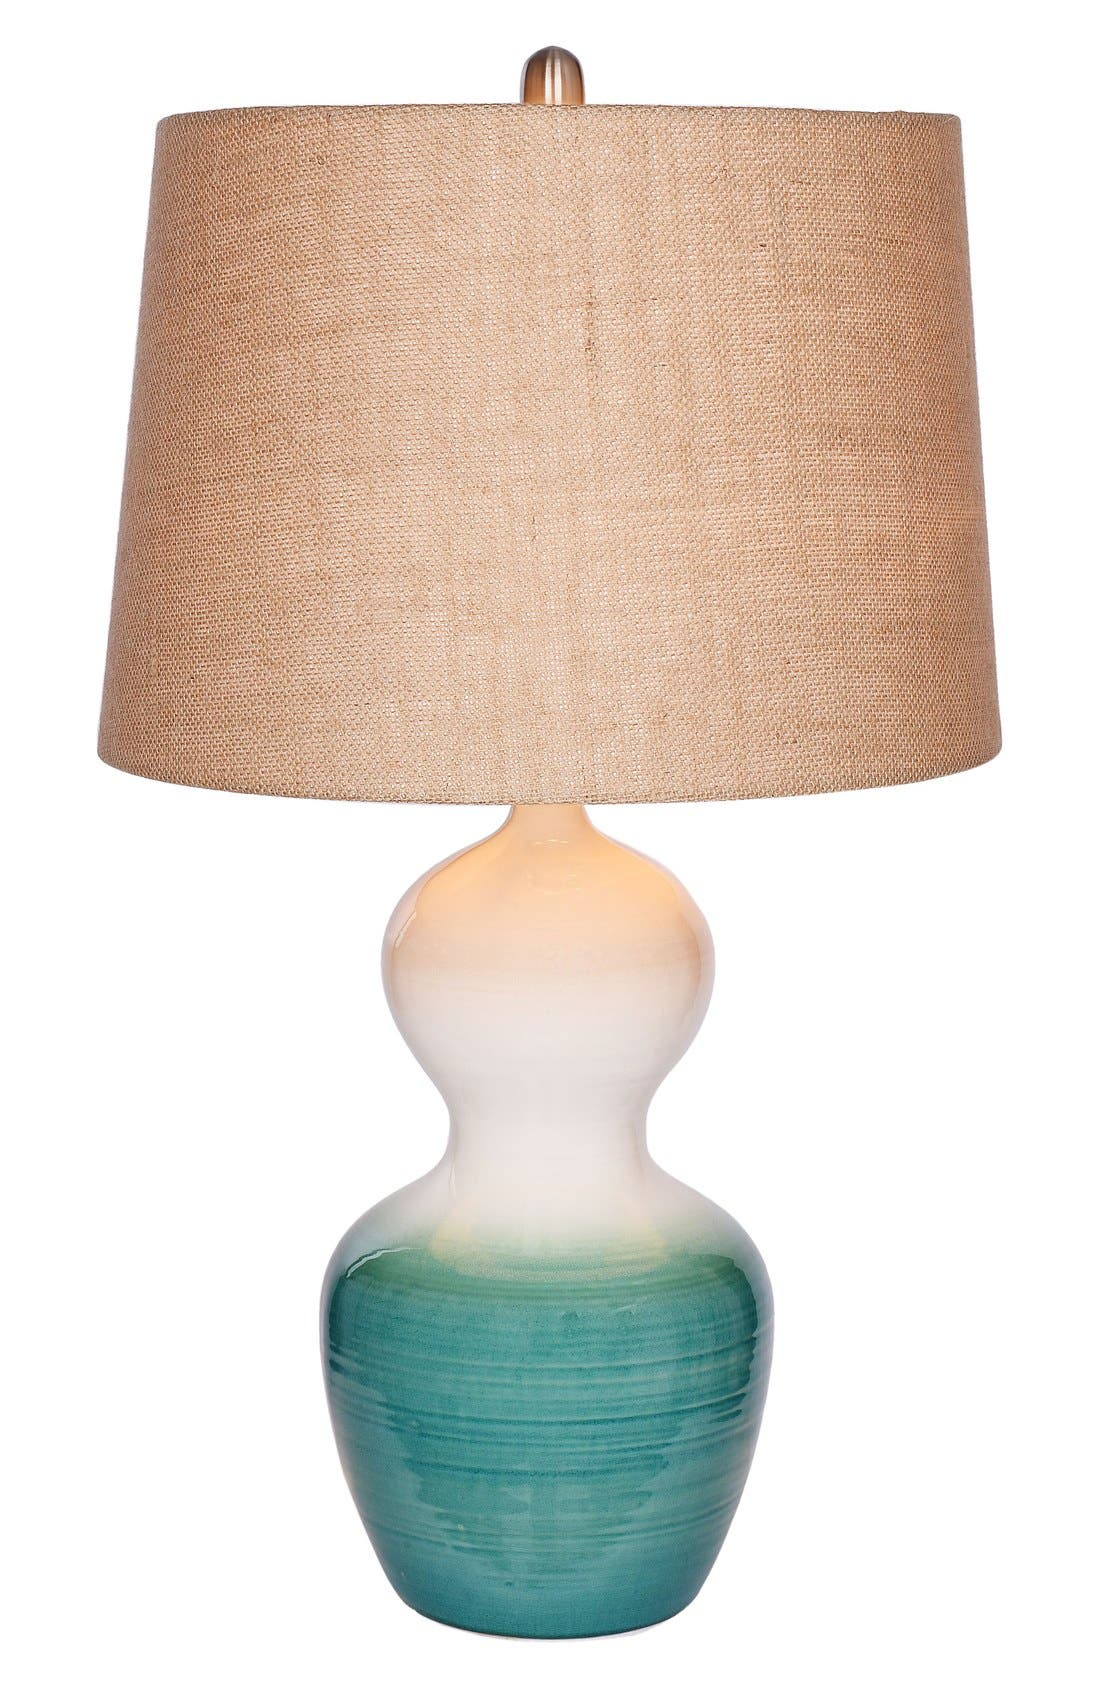 Main Image - JAlexander Skylar Ombré Ceramic Table Lamp